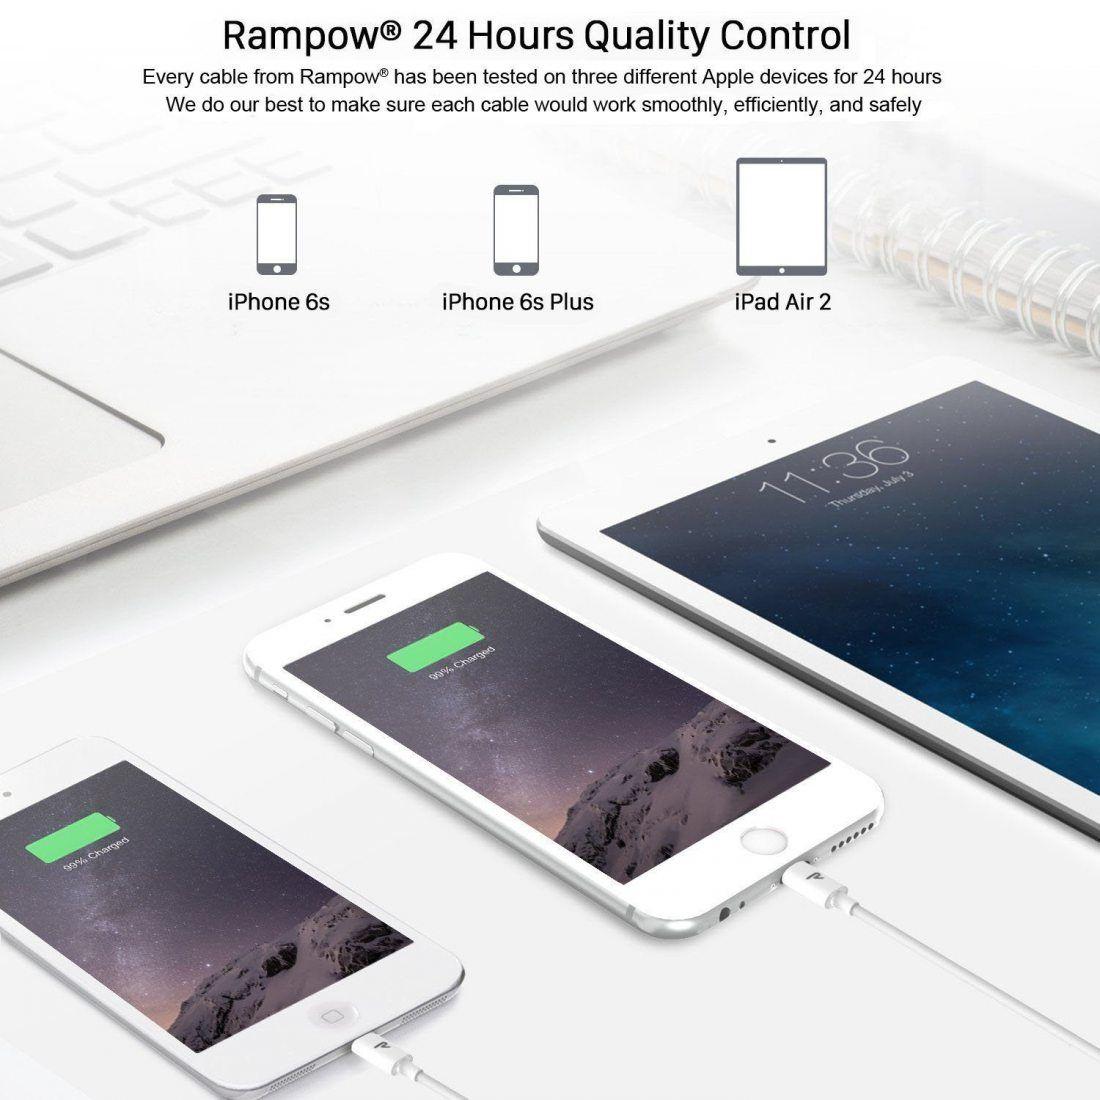 Câble iPhone Rampow® [MFI certifié Apple] - GARANTIE À VIE - Câble Lightning vers USB pour iPhone 8 / 8 Plus / 7 / 7 Plus / 6